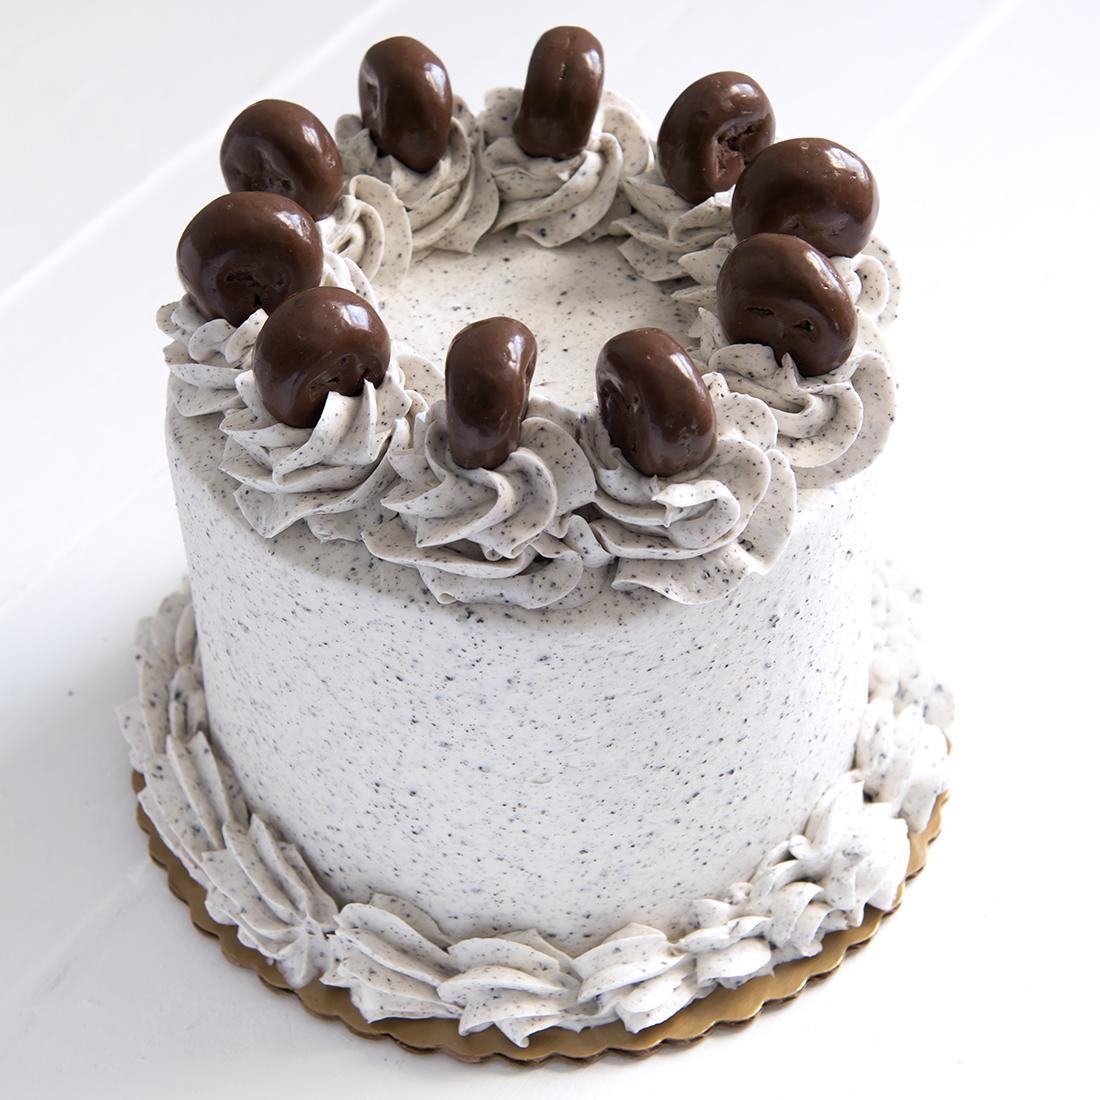 Oreo Explosion - Chocolate cake layered with Oreo mousse, Oreo buttercream frosting, mini chocolate covered Oreos6